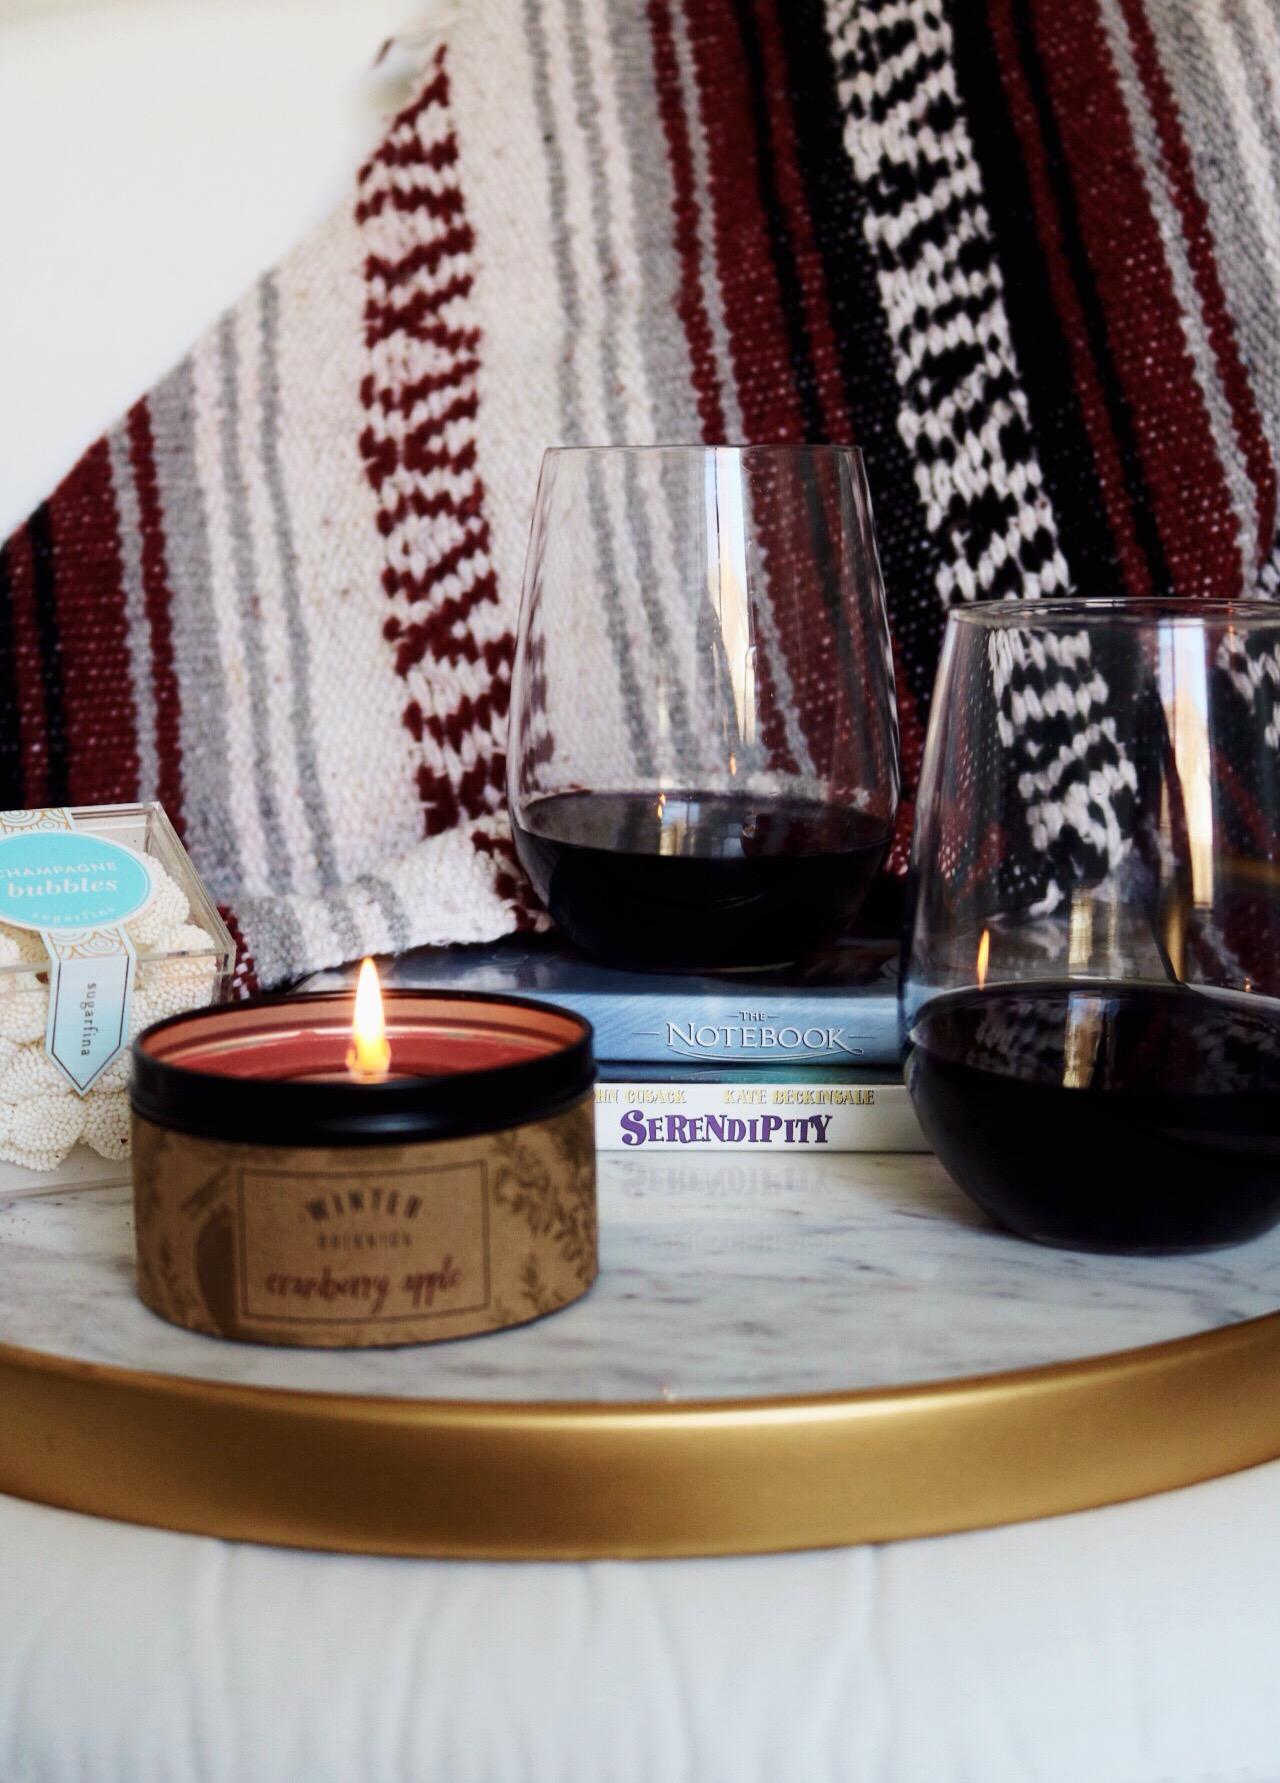 Serendipity, The Notebook, Stemless Wine Glass, WorldMarket Serving Tray, Sugarfina,